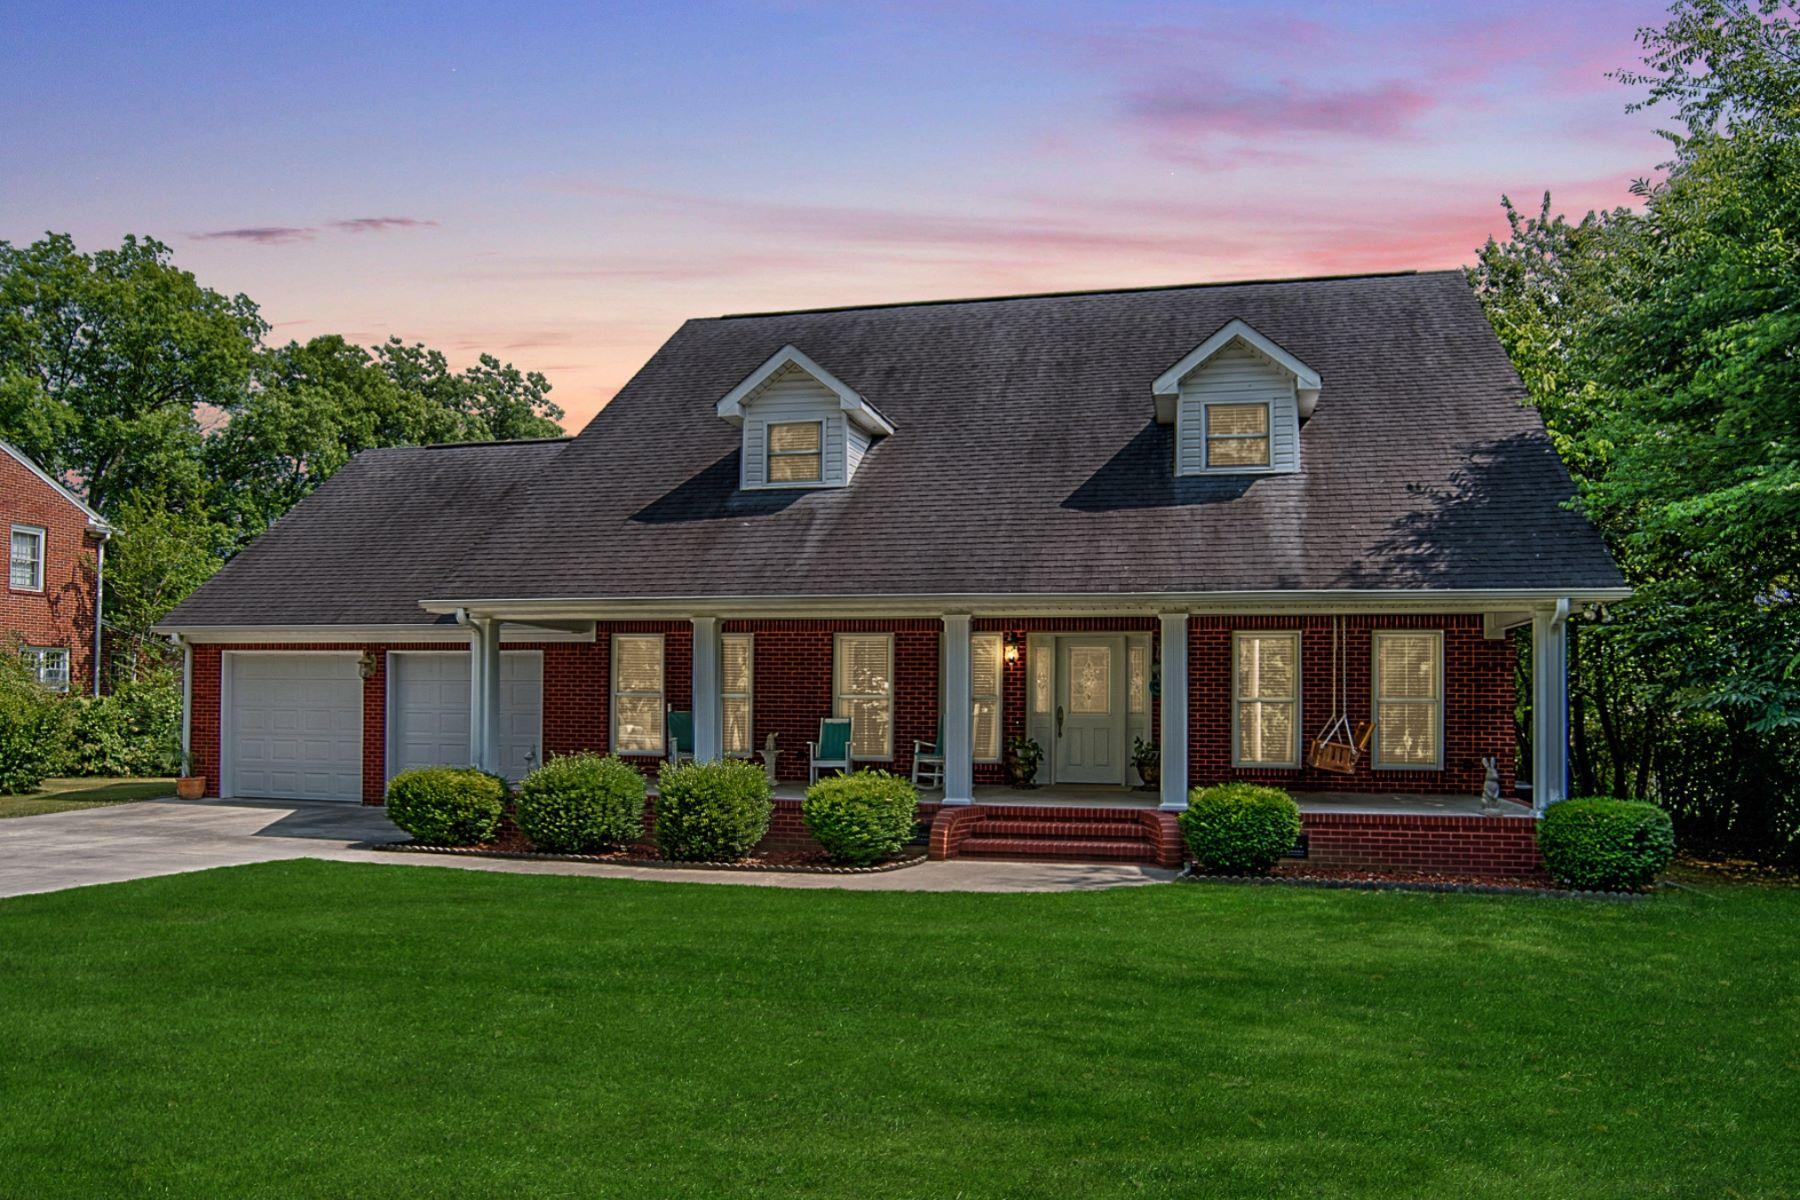 Single Family Homes for Active at 311 Hodges Street Scottsboro, Alabama 35768 United States